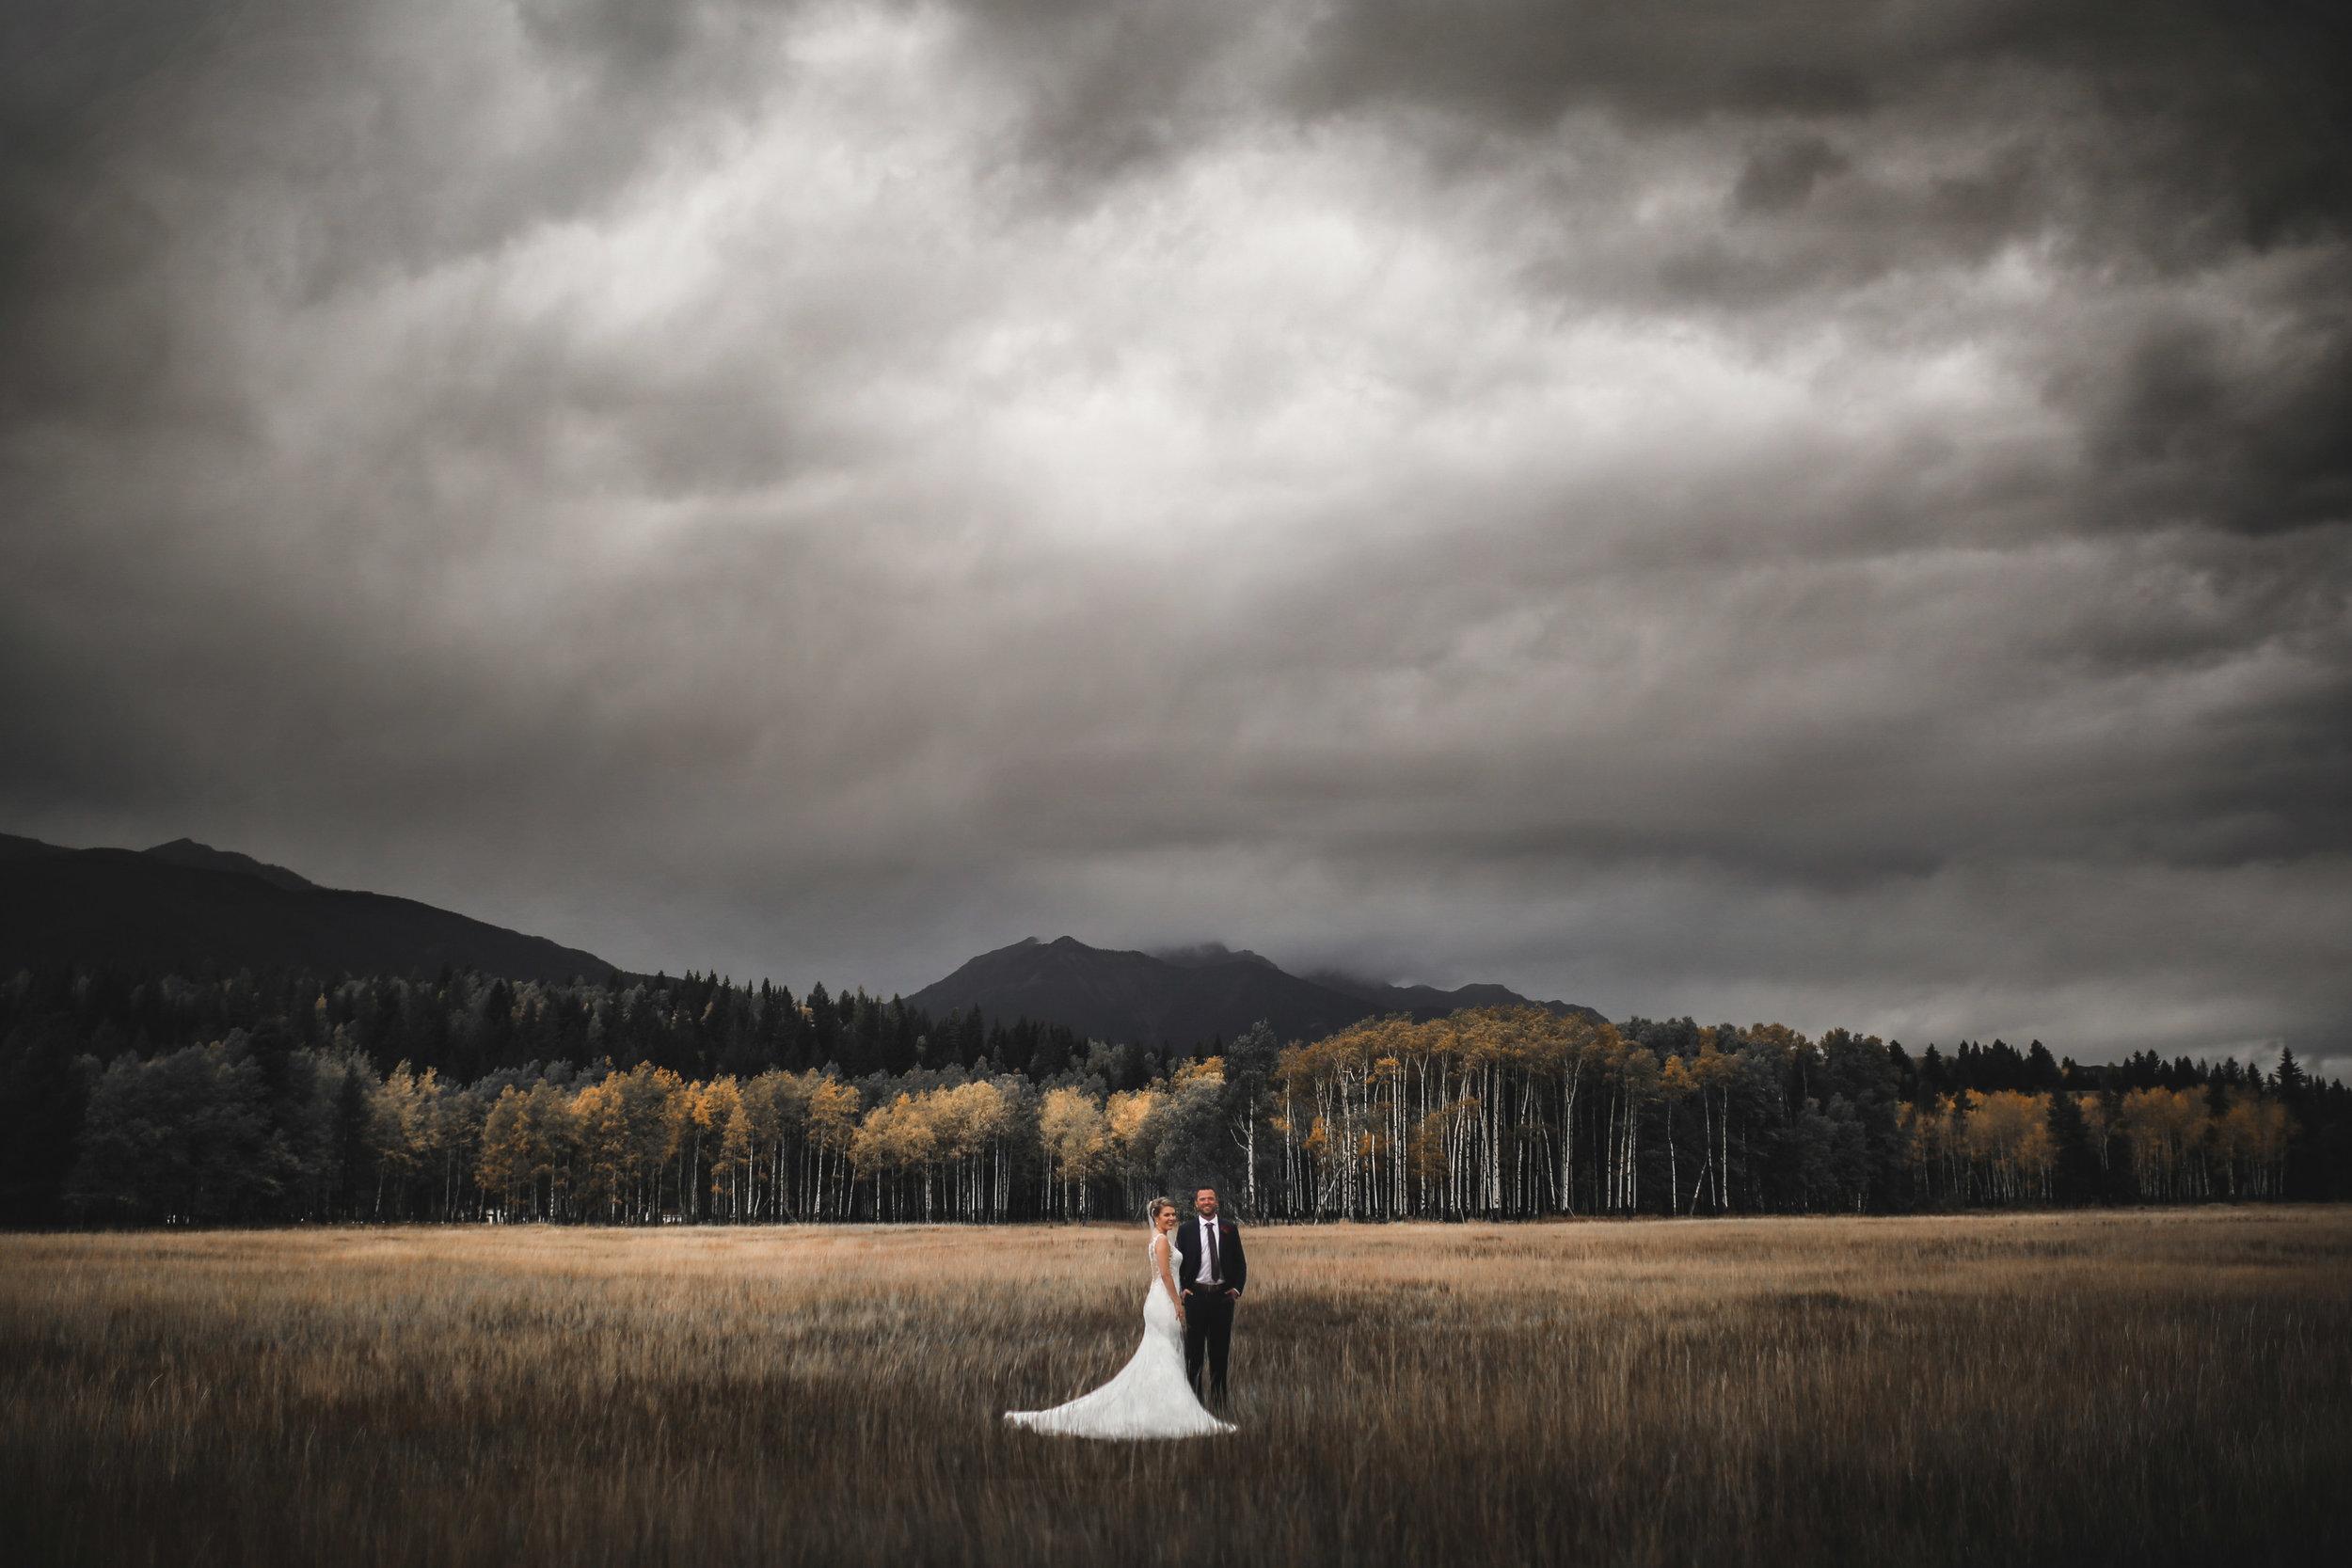 03 Adam Ziorio Photography - Vitoria BC Wedding photographer - Nick&Bree Fernie BC Wedding.jpg